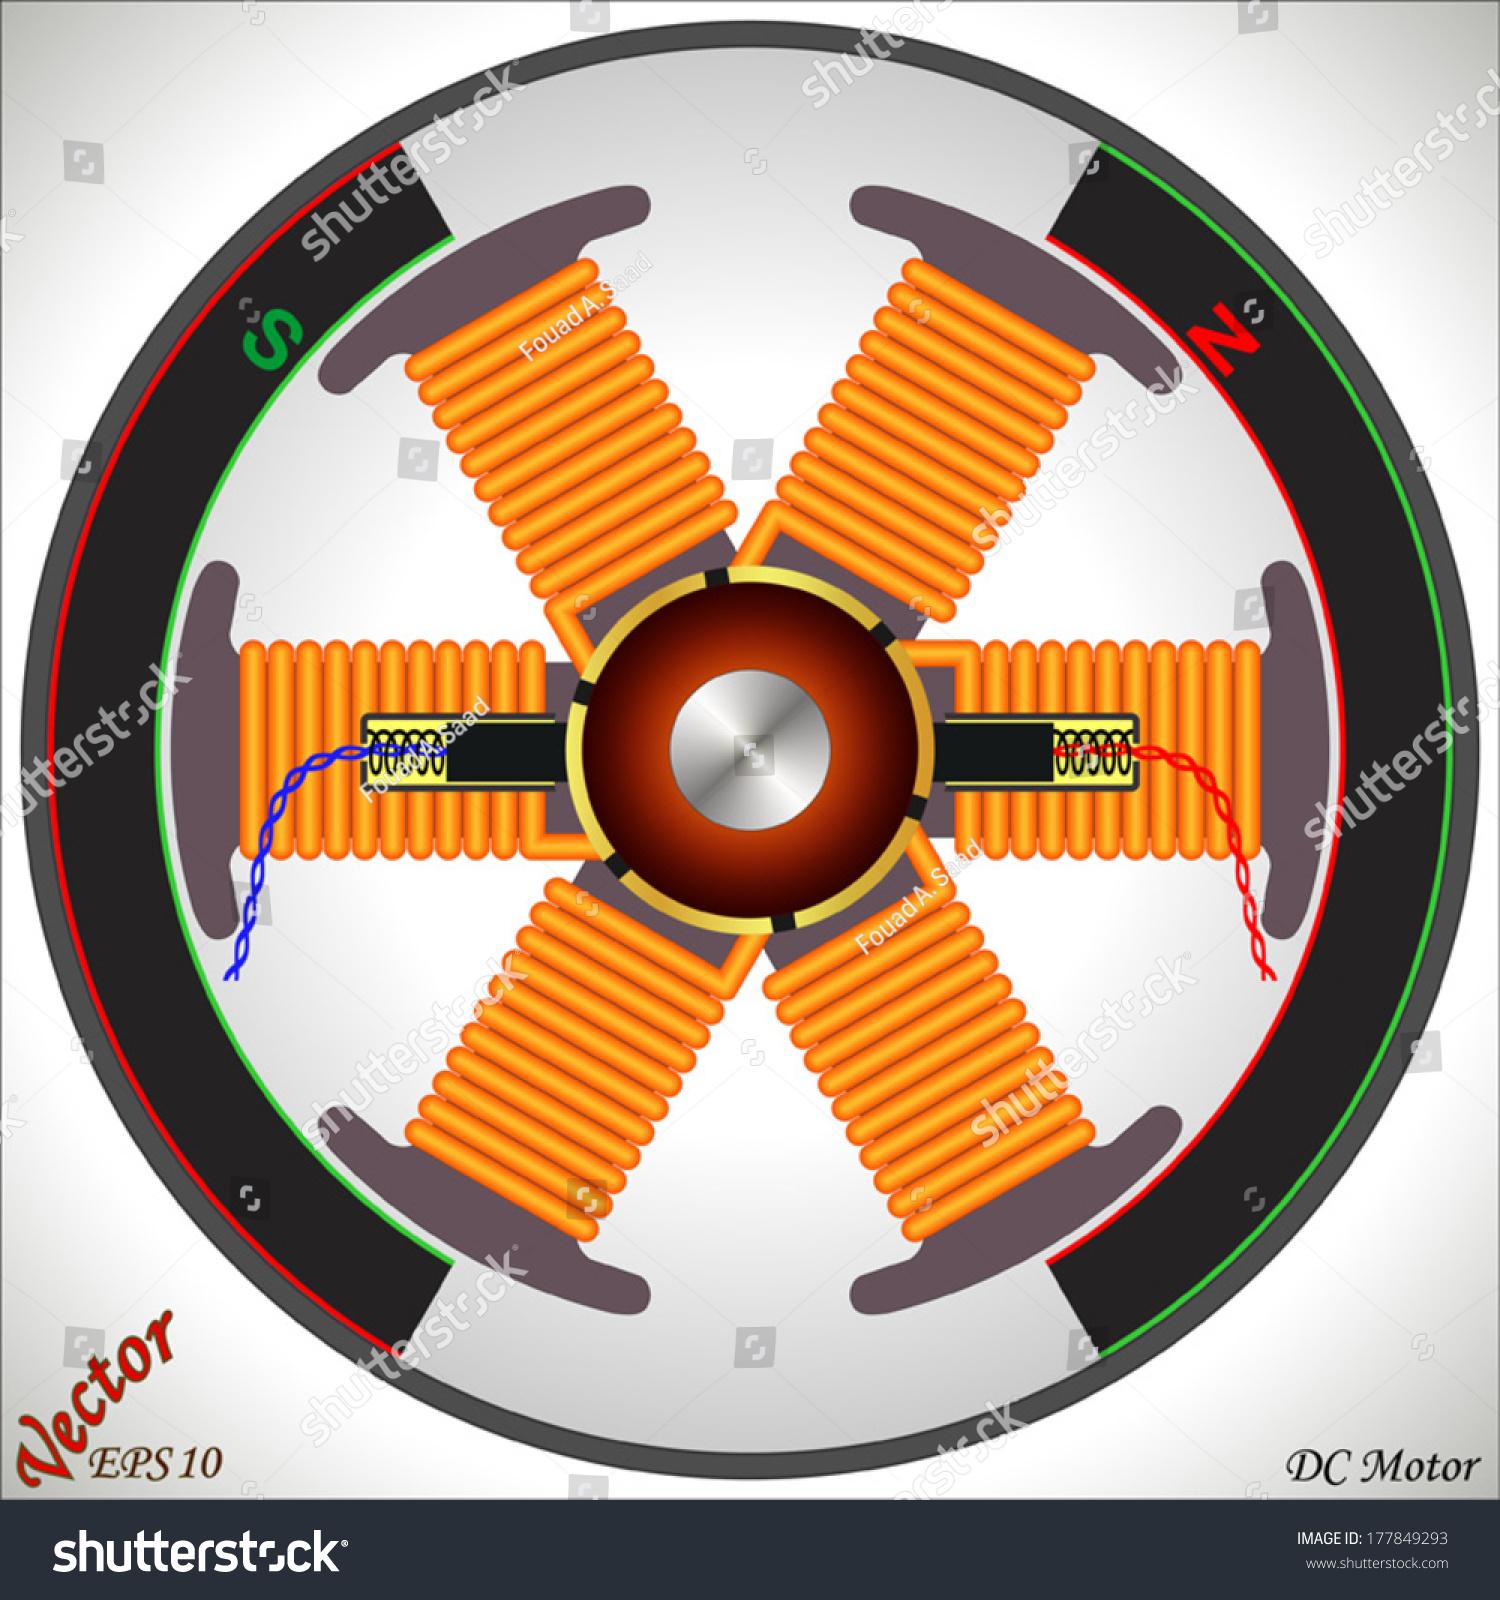 dc motor 6 poles stock vector 177849293 shutterstock dc motor 6 poles